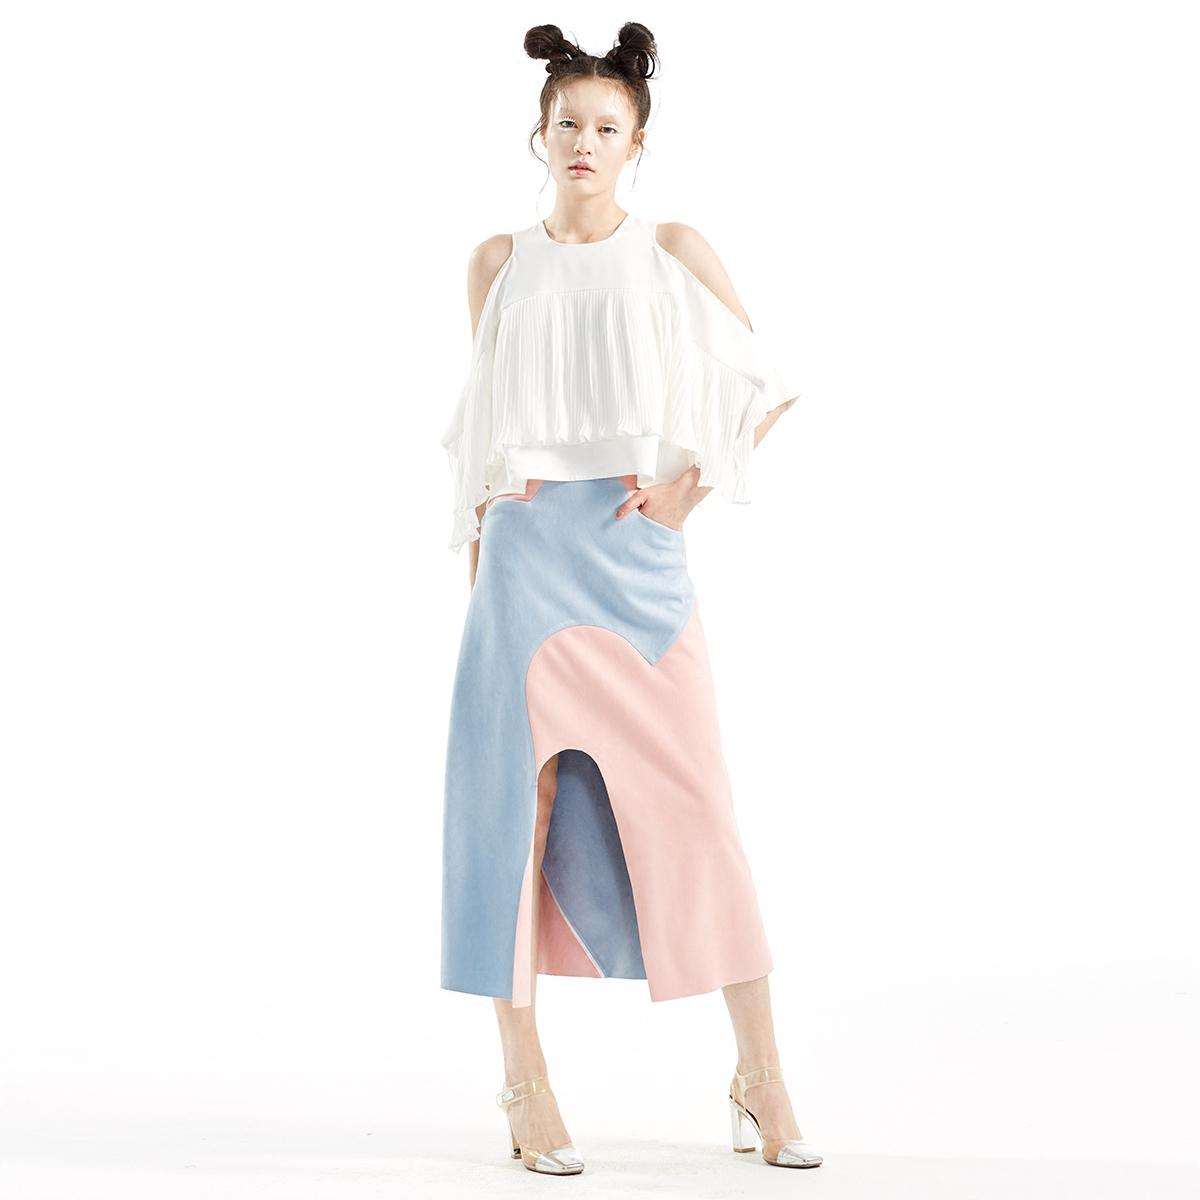 SUNGDO GIN春夏白日梦系列粉蓝拼高能撞色高腰心形分割长裙半裙